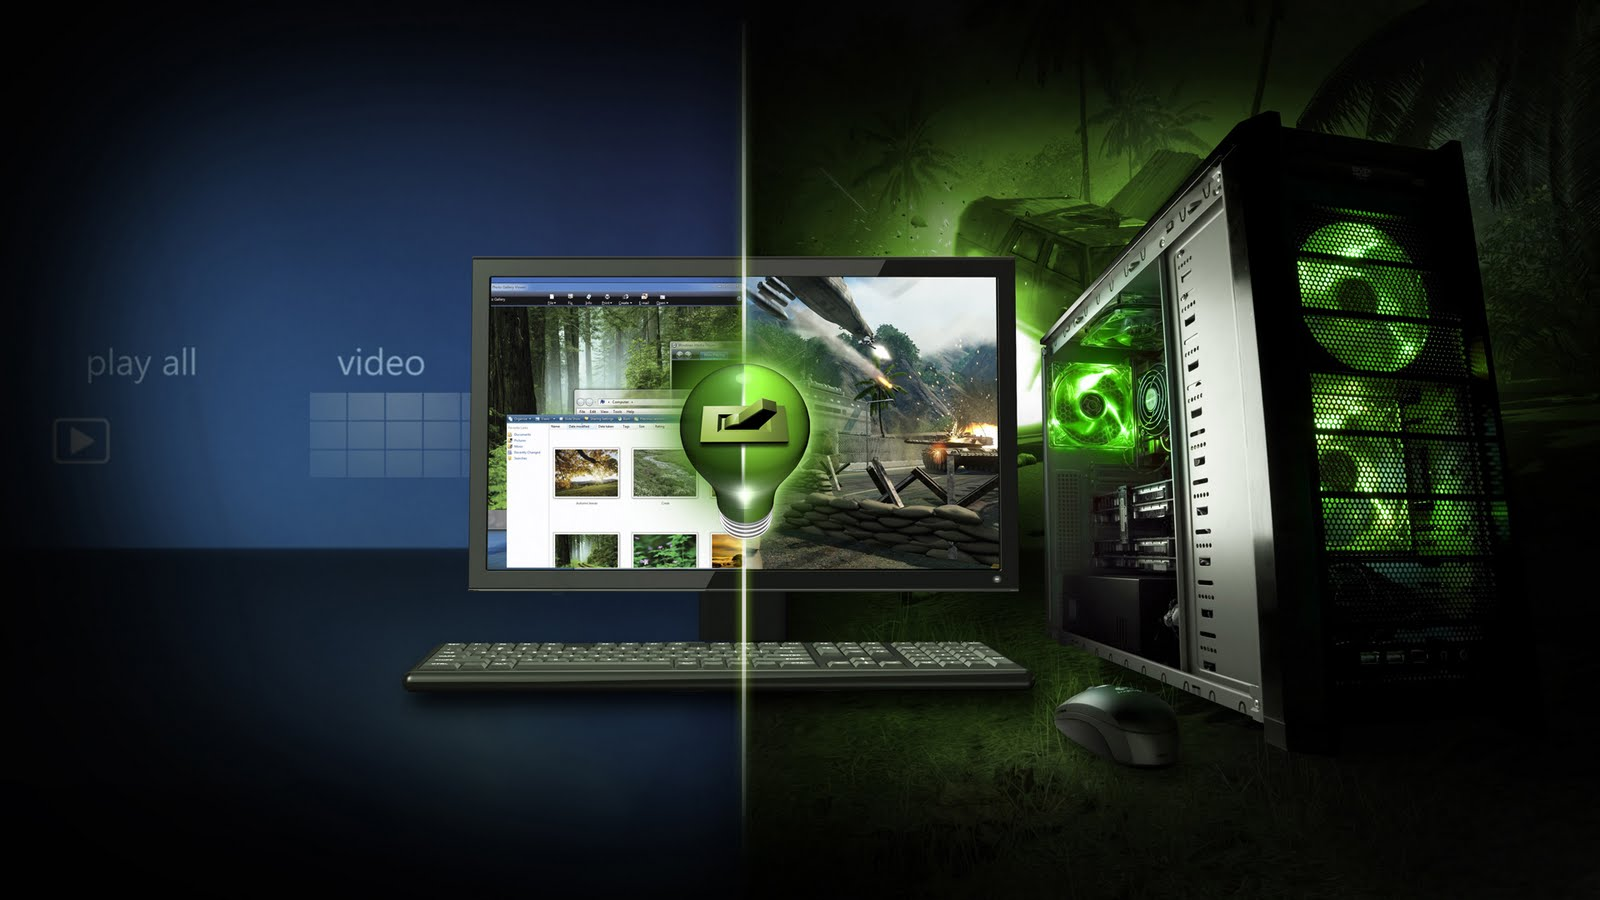 http://1.bp.blogspot.com/-hGg9yPR0IYE/TaFJQM9dtfI/AAAAAAAAAFU/q6Q5GFZg9tY/s1600/AMD_Gaming_System_Teaser.jpg